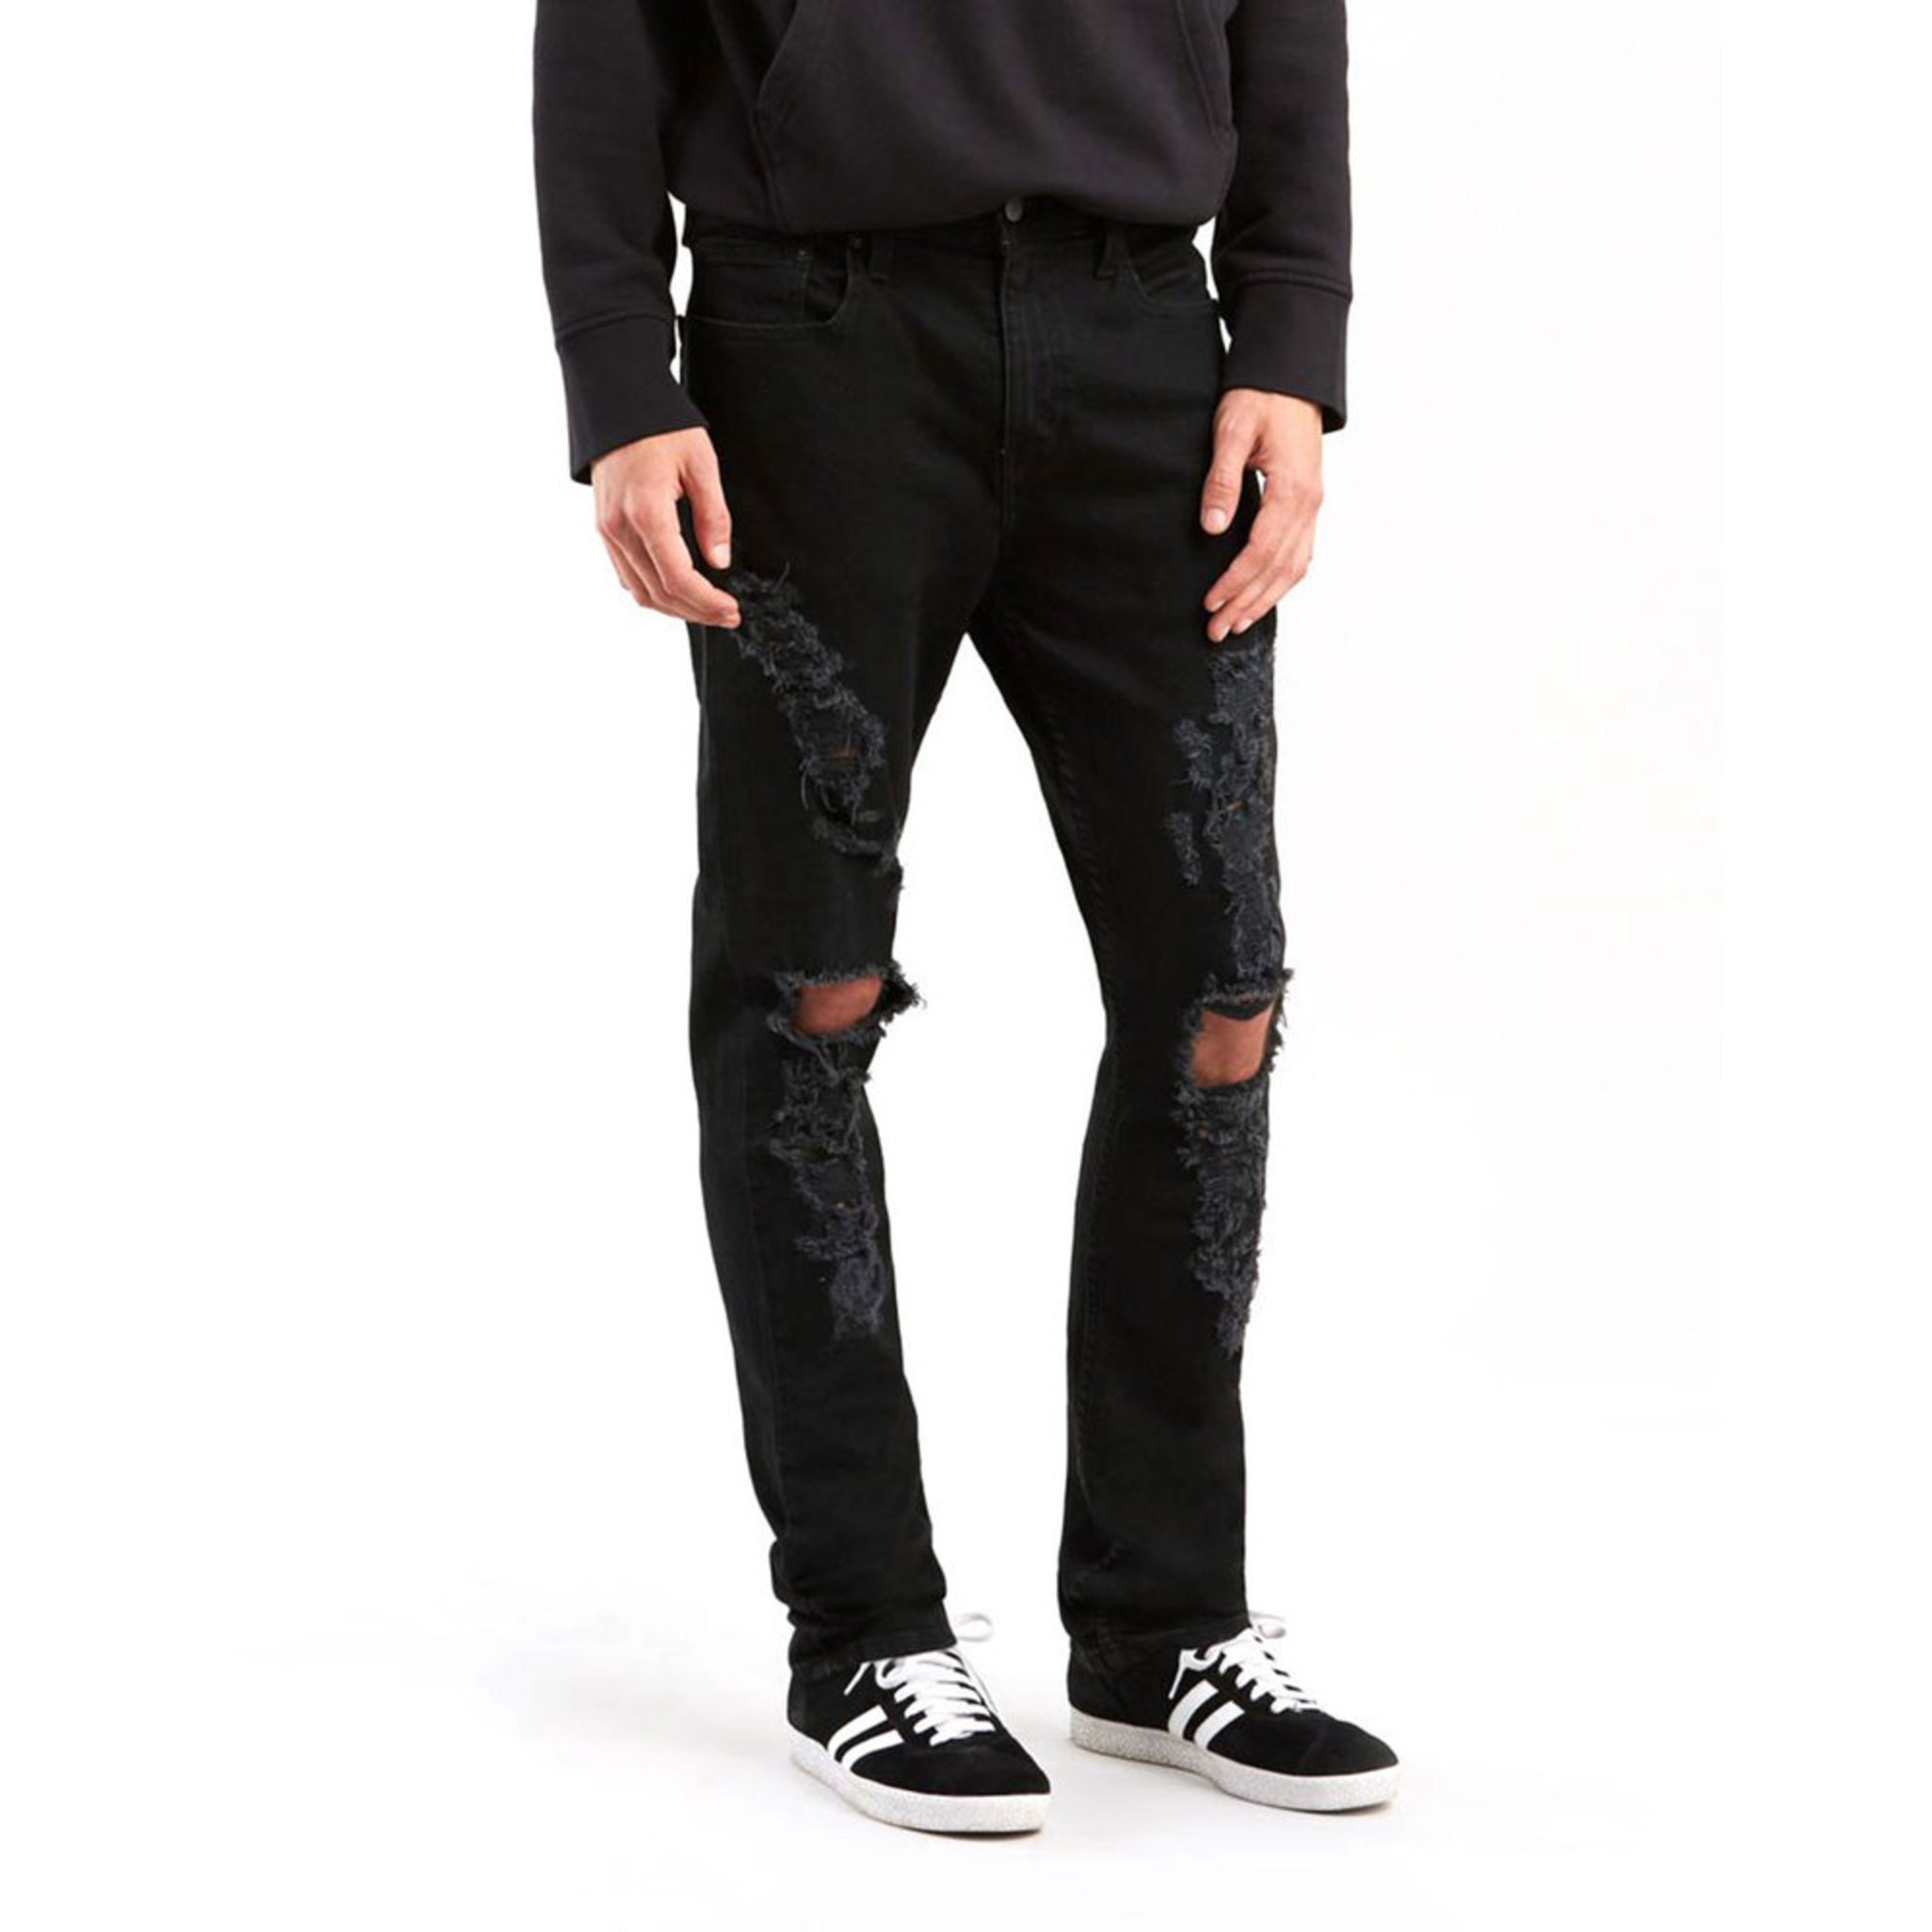 c28e0f753dd Levi s Men s 512 Slim Tapered Rip-n-tear Jeans